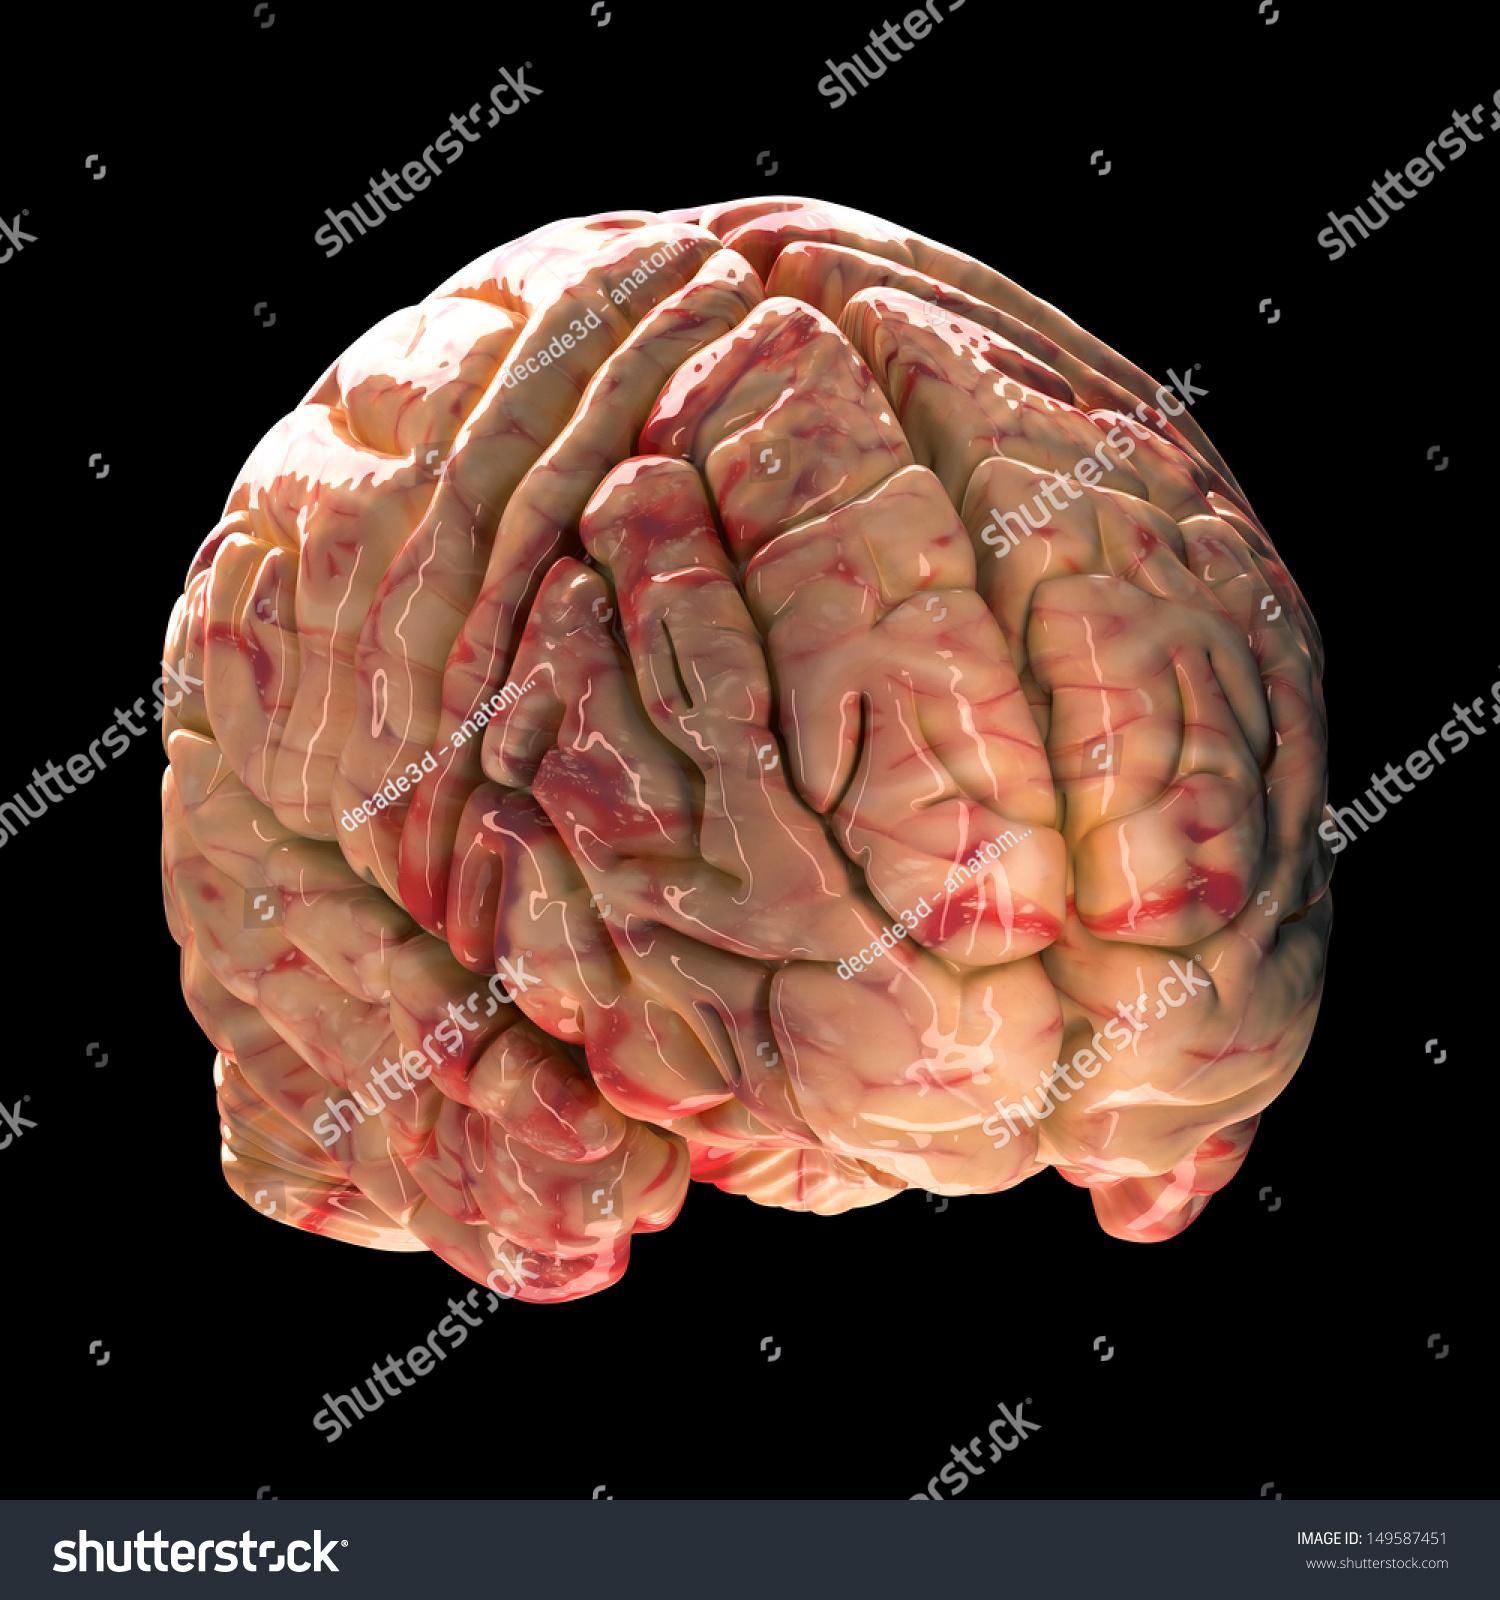 Anatomy Brain Isometric View On Black Stock Illustration - Royalty ...